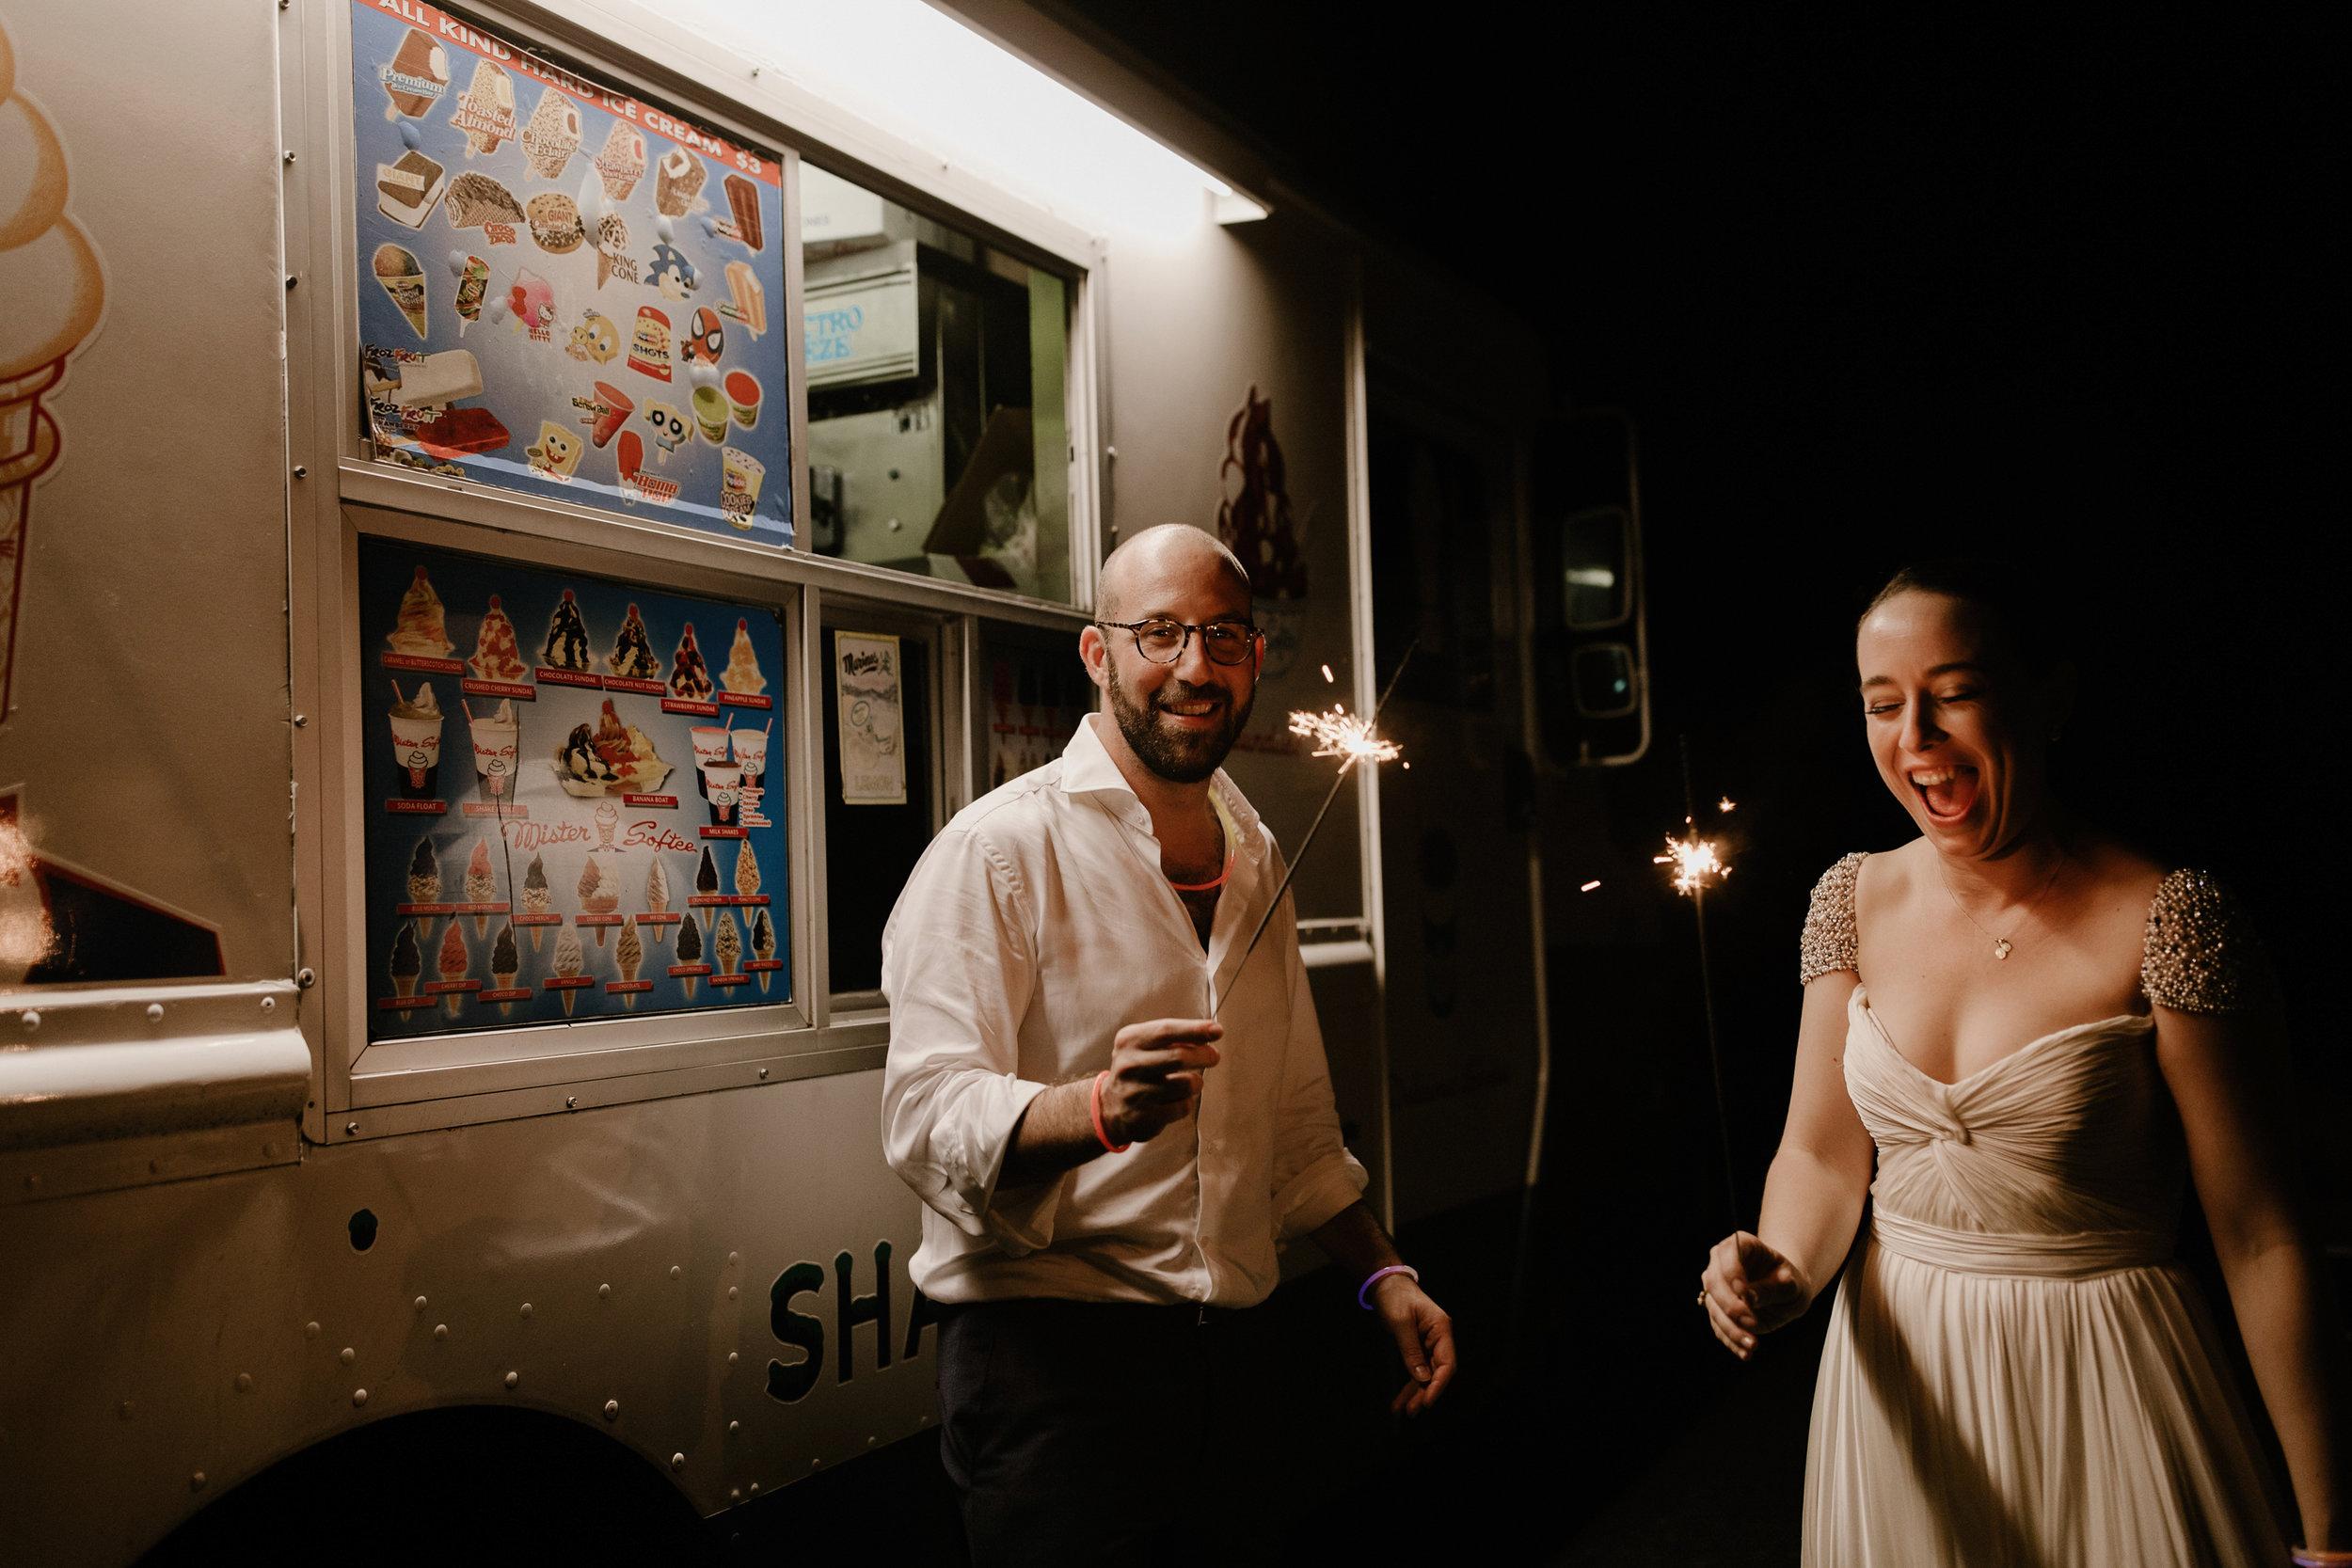 East-Hampton-New-York-Wedding-Photographer  (7 of 7).jpg